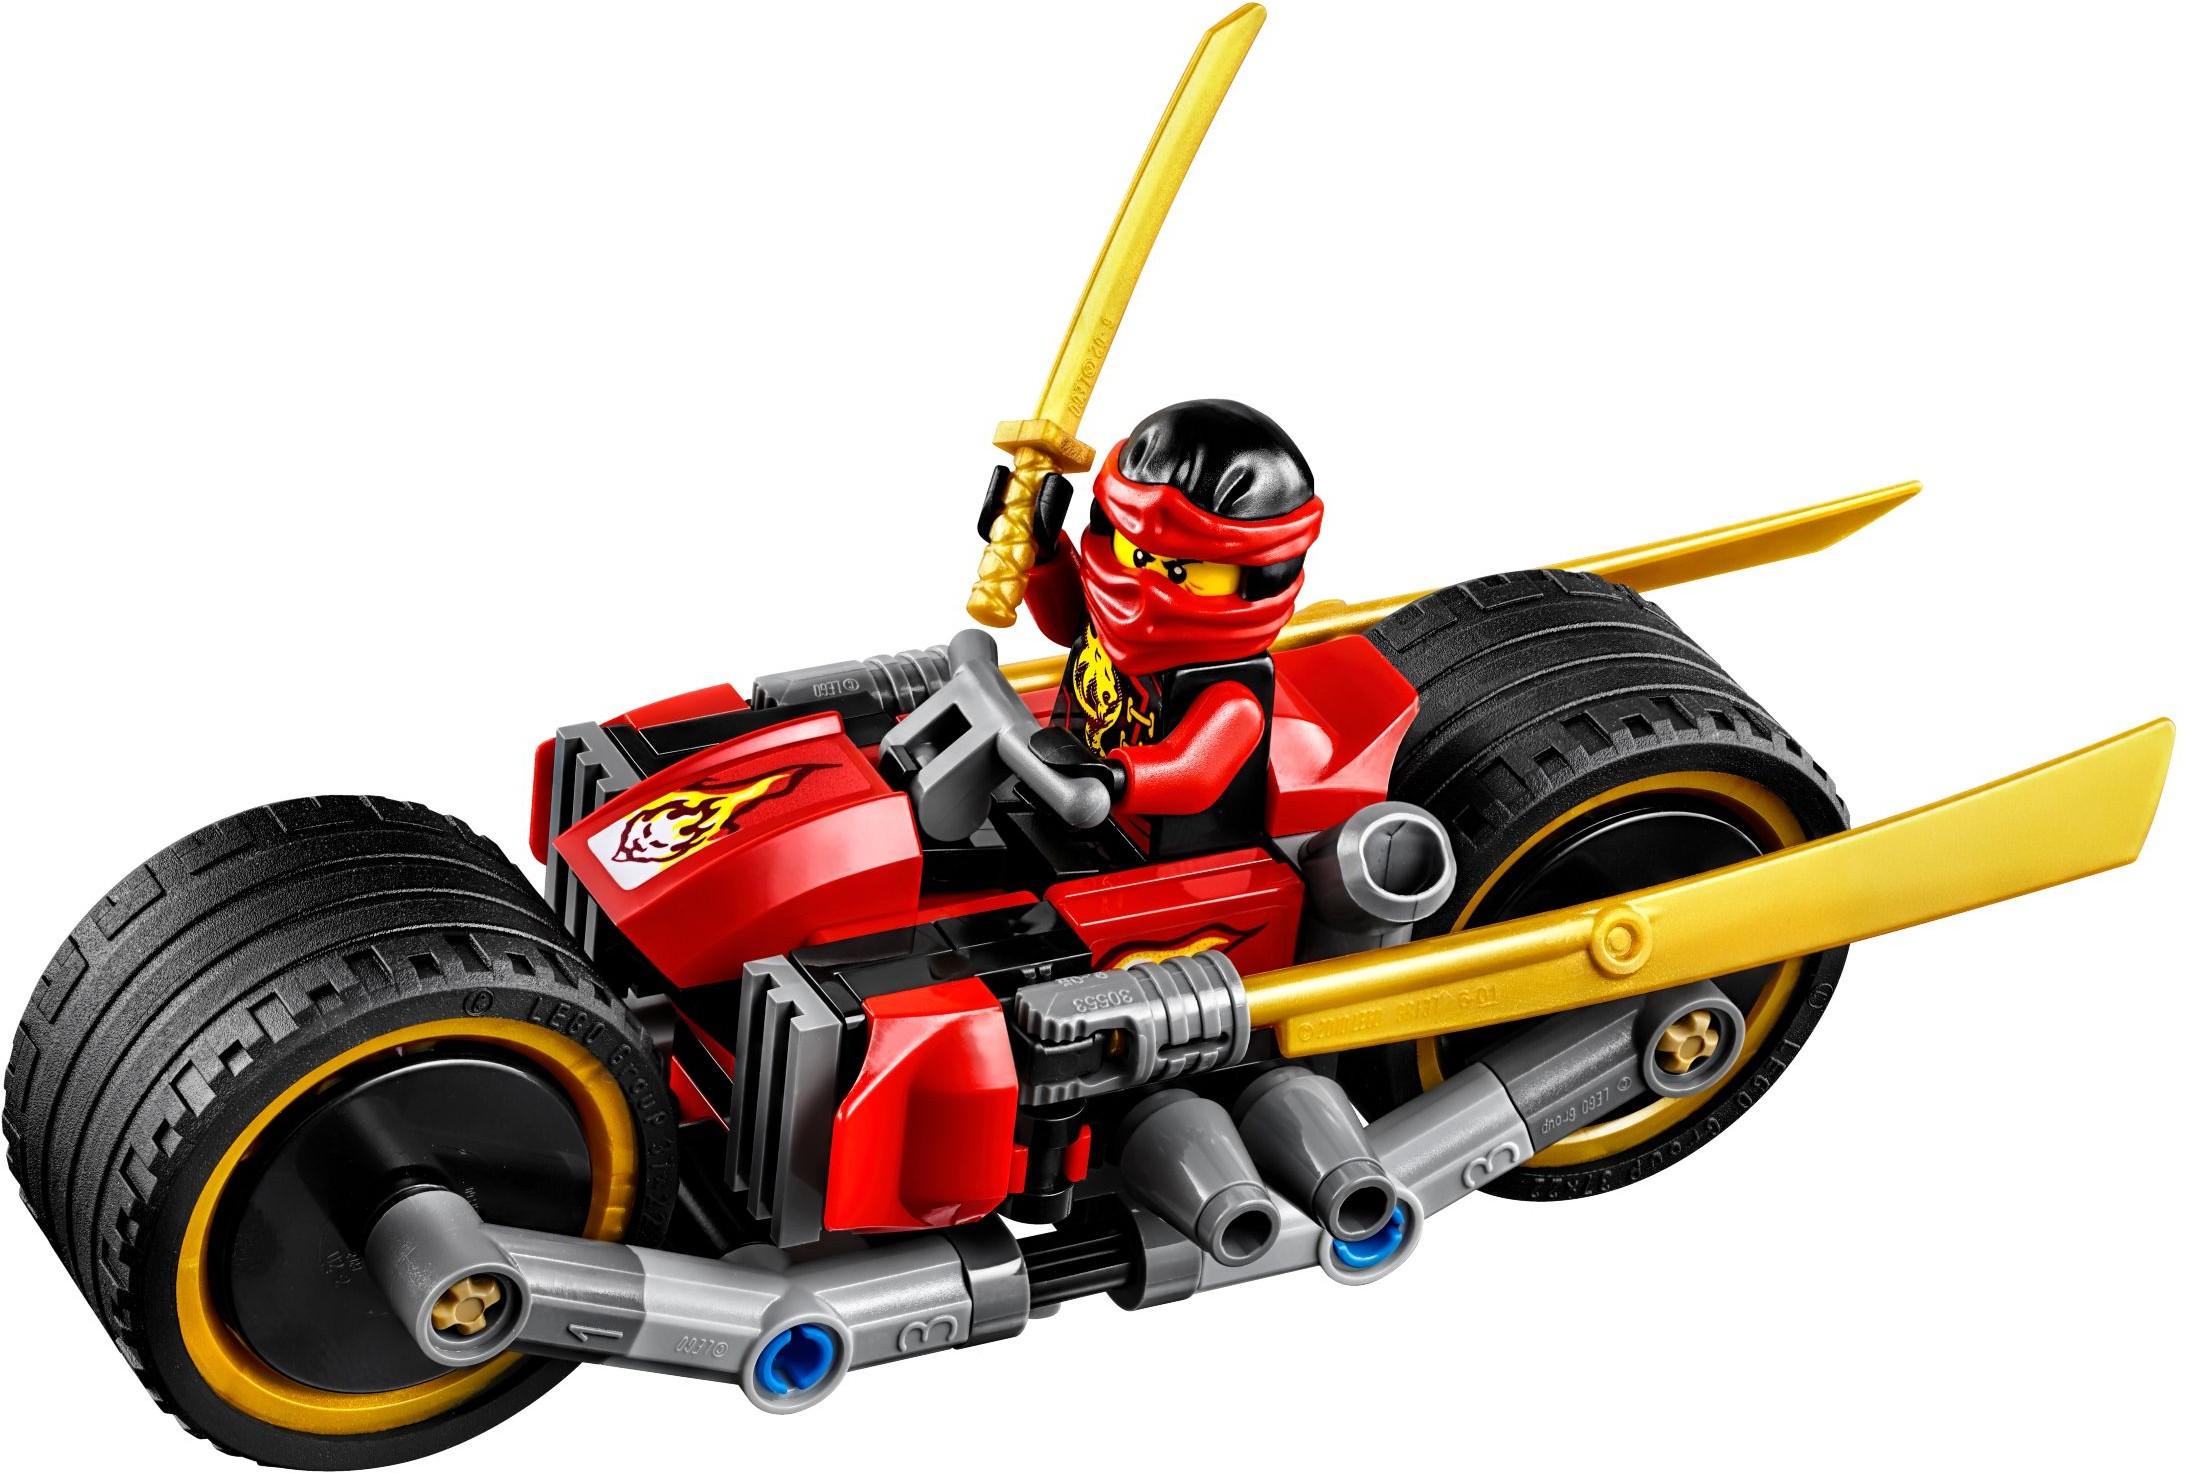 Lego ninjago 70600 pas cher la poursuite en moto des ninja - Lego ninjago voiture ...